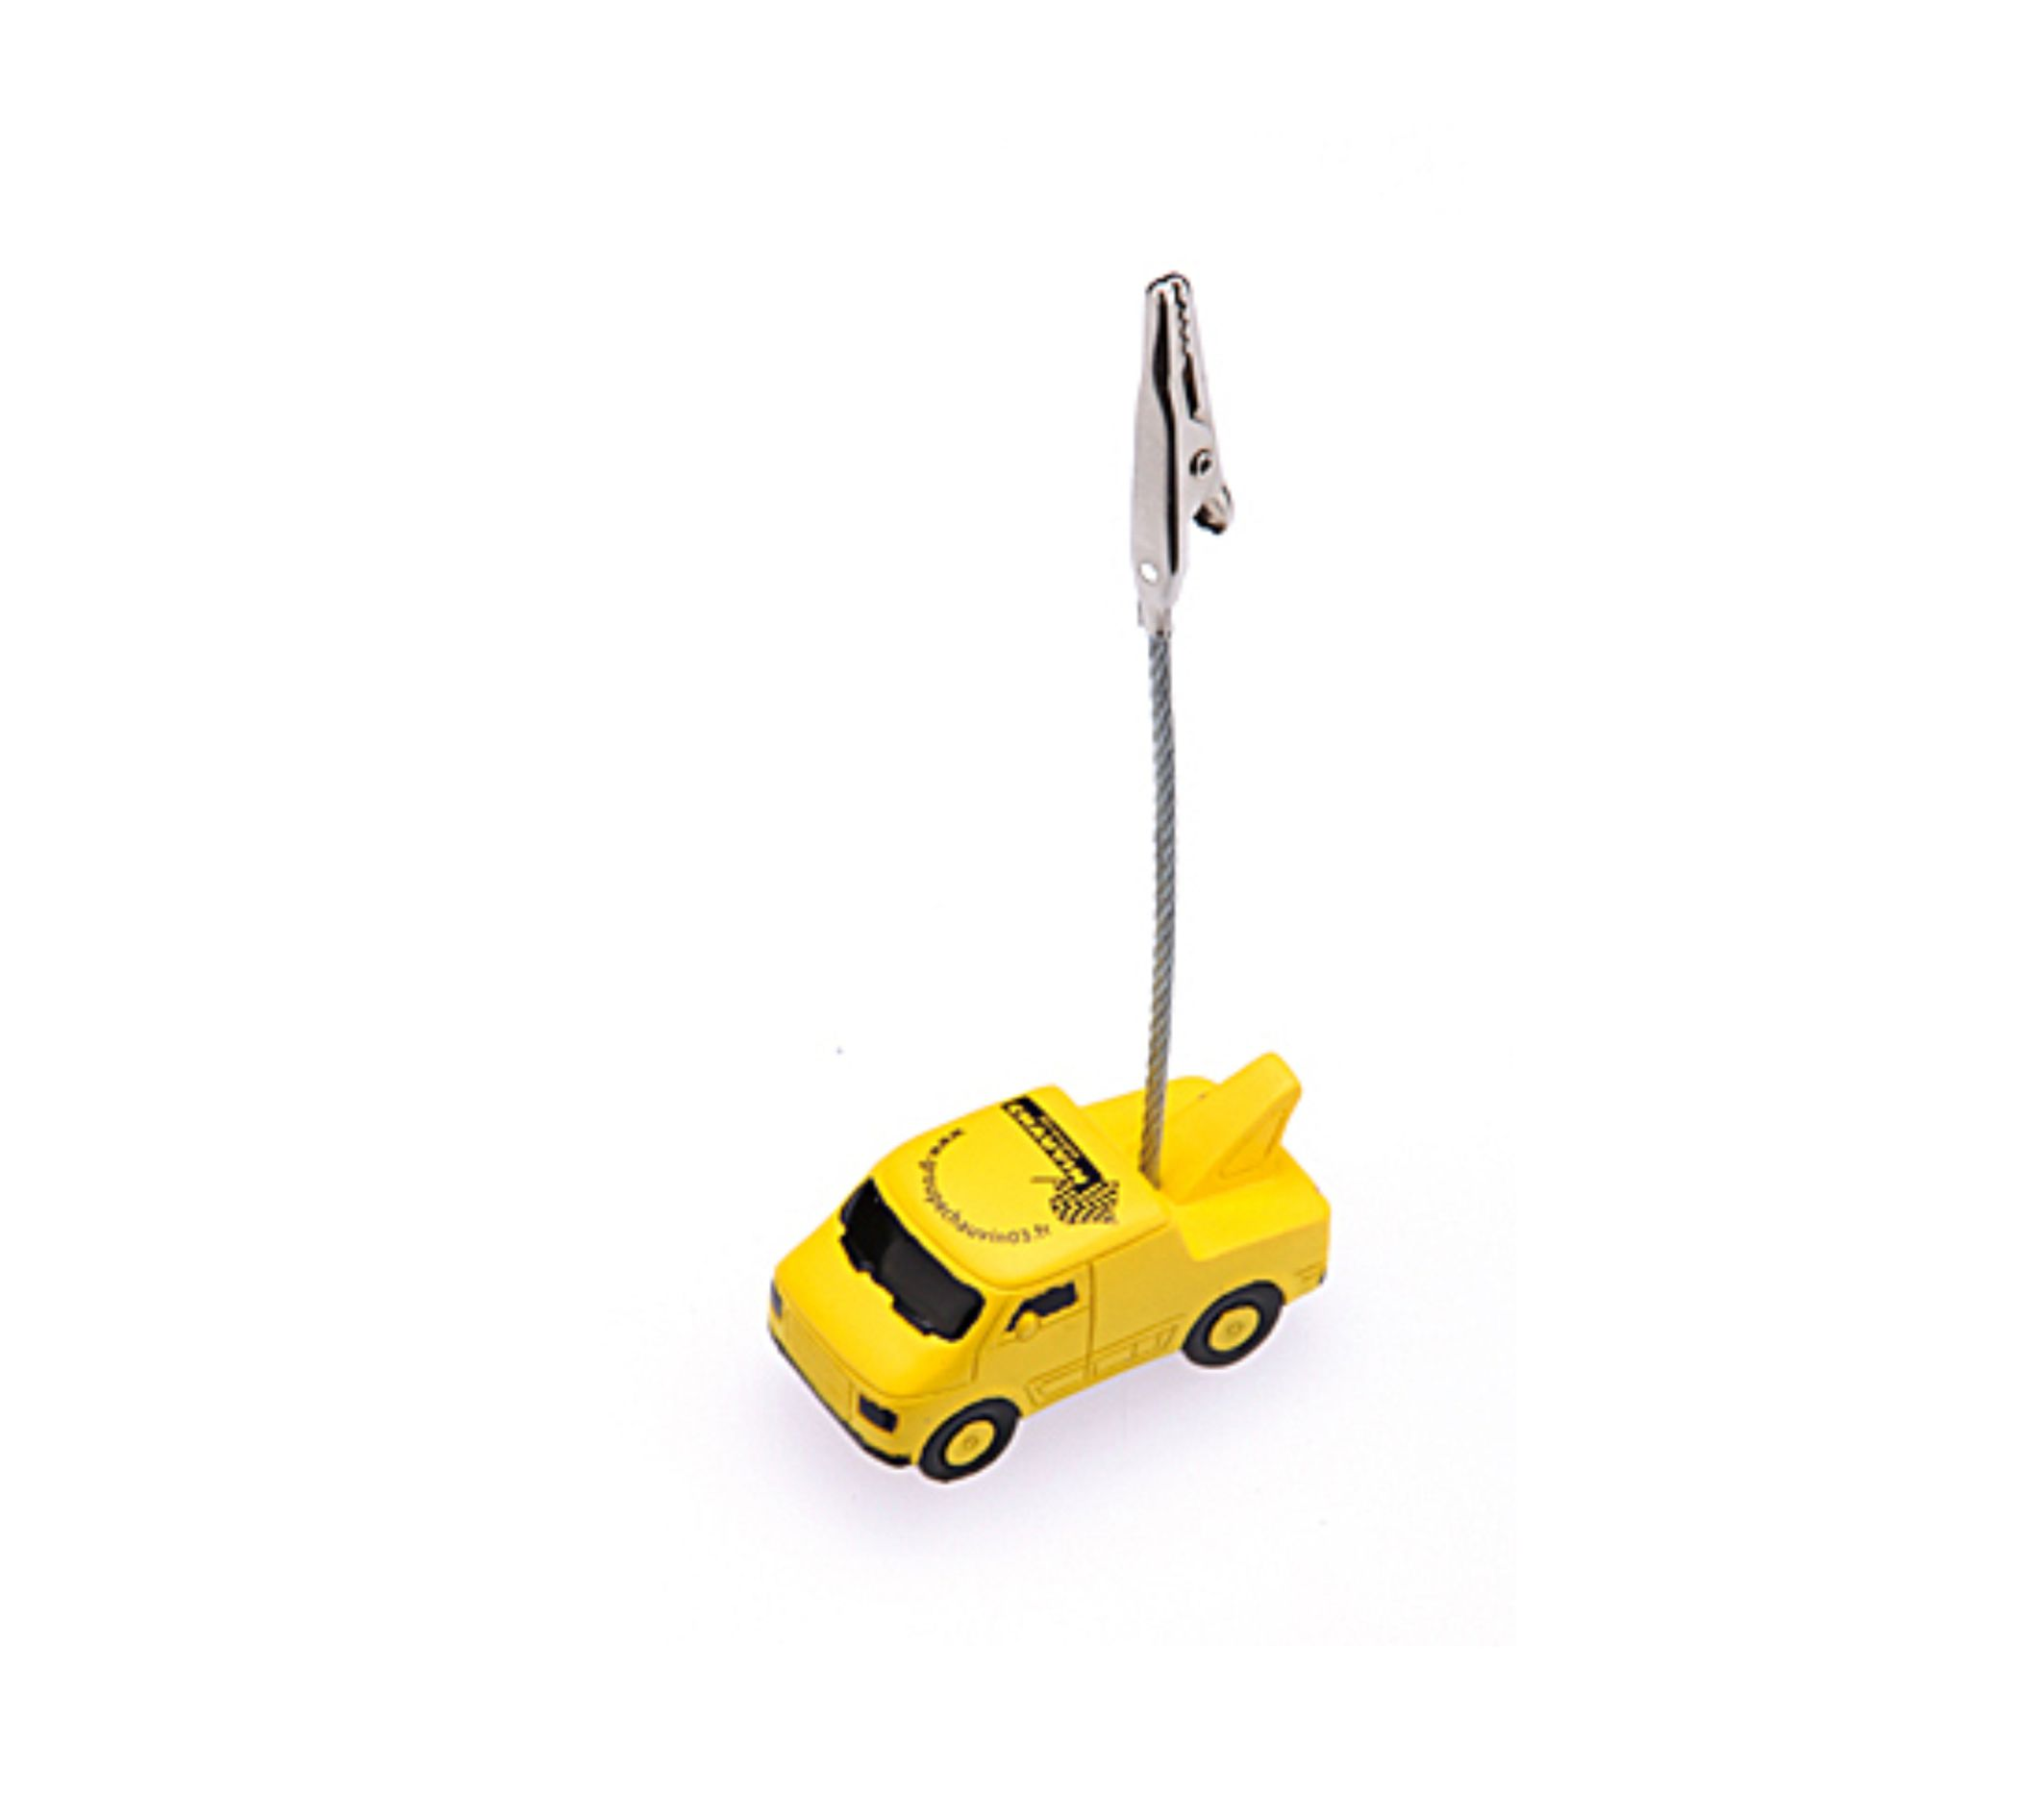 Memo-clip with 3D Miniature